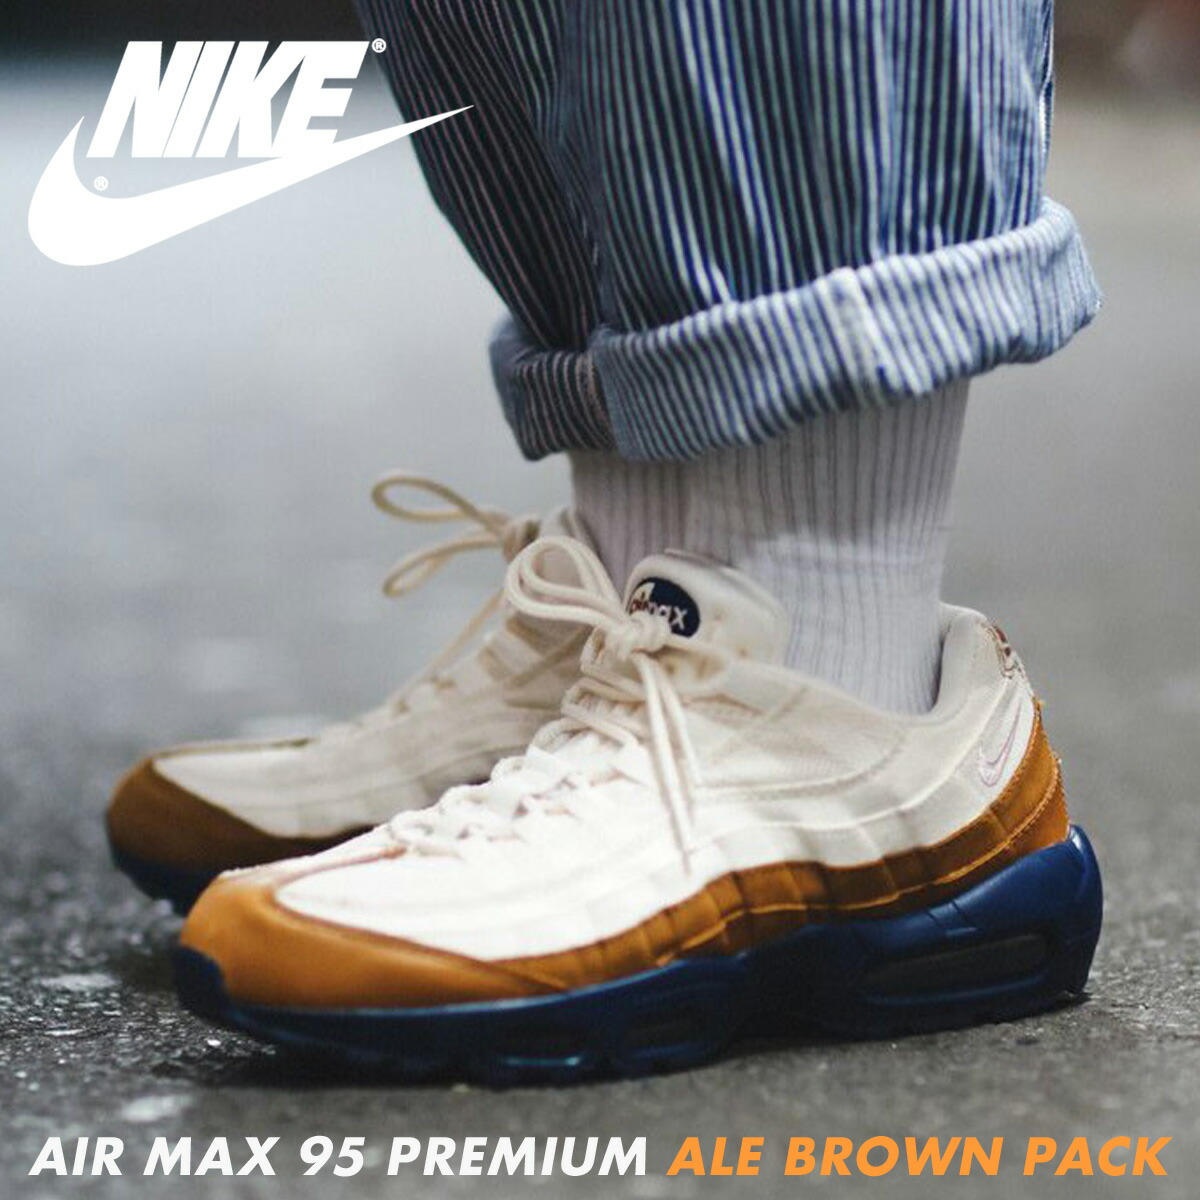 nike air max 95 ale brown pack